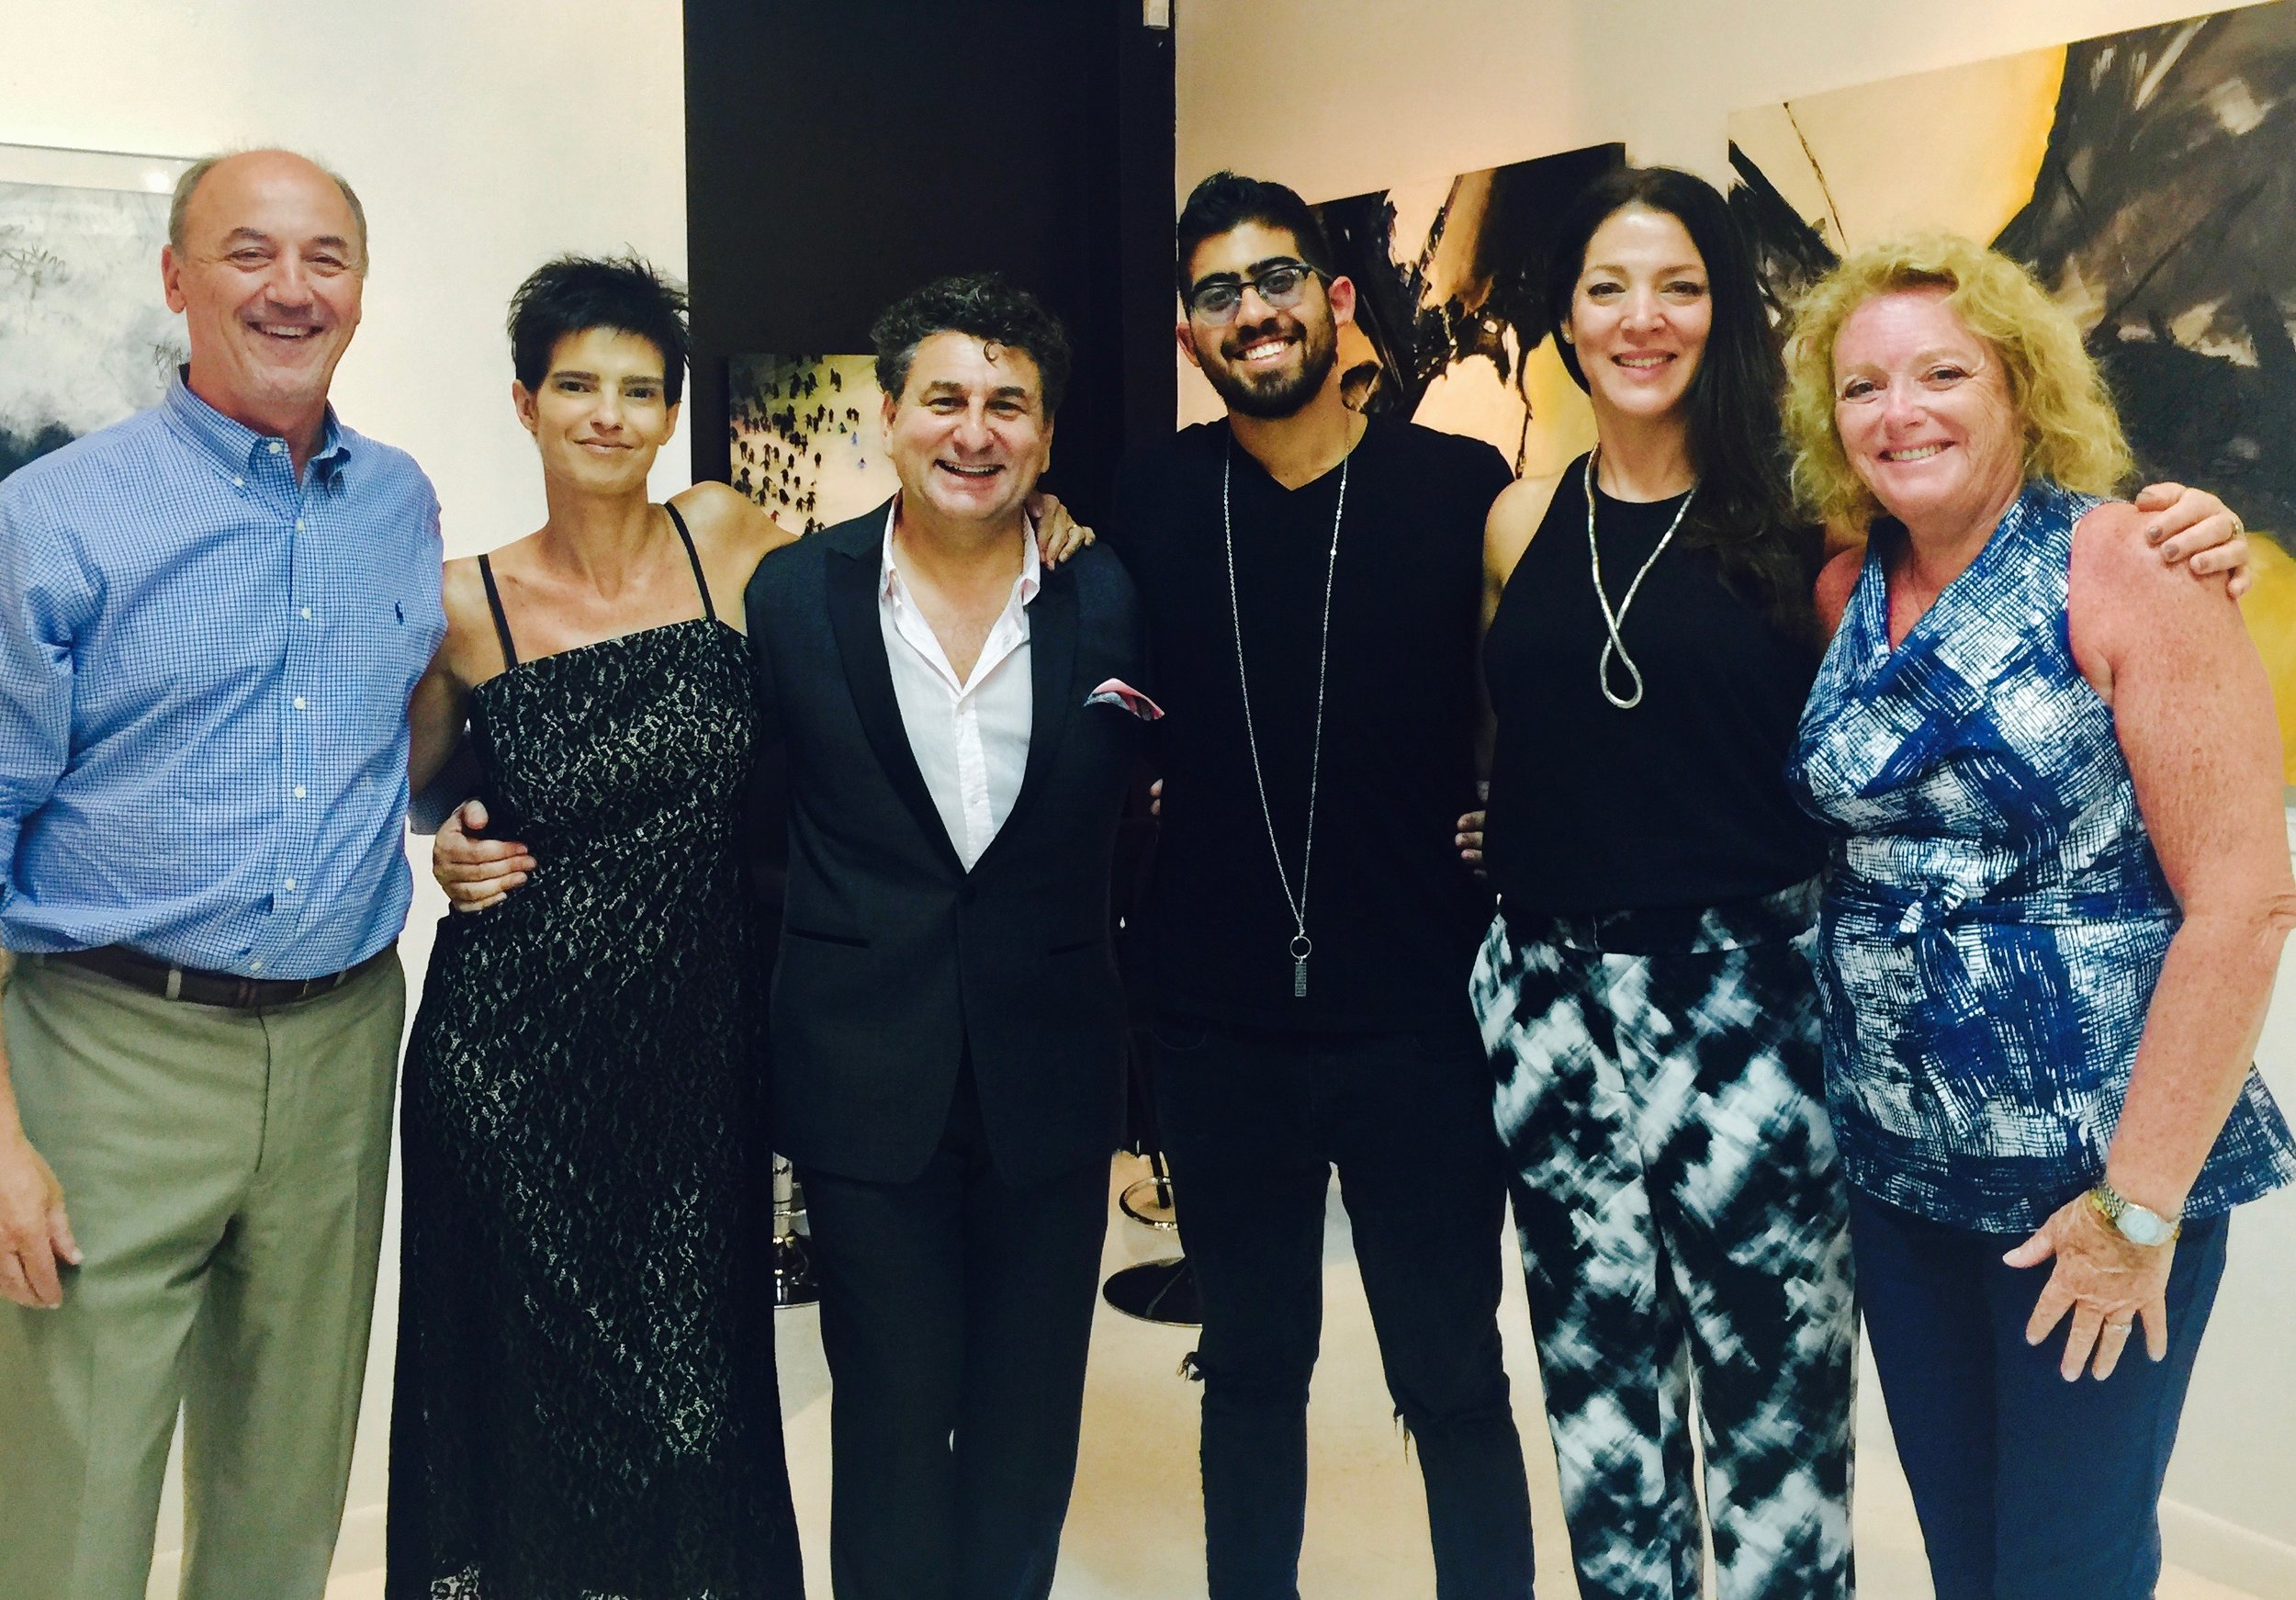 Group of Artists (left to right): Ricardo Trotti, Viviana Andon, Eduardo Rubin, Gianfranco Tomasetti, Gabriela Kerszenblat and Maria Teresa Hafford.